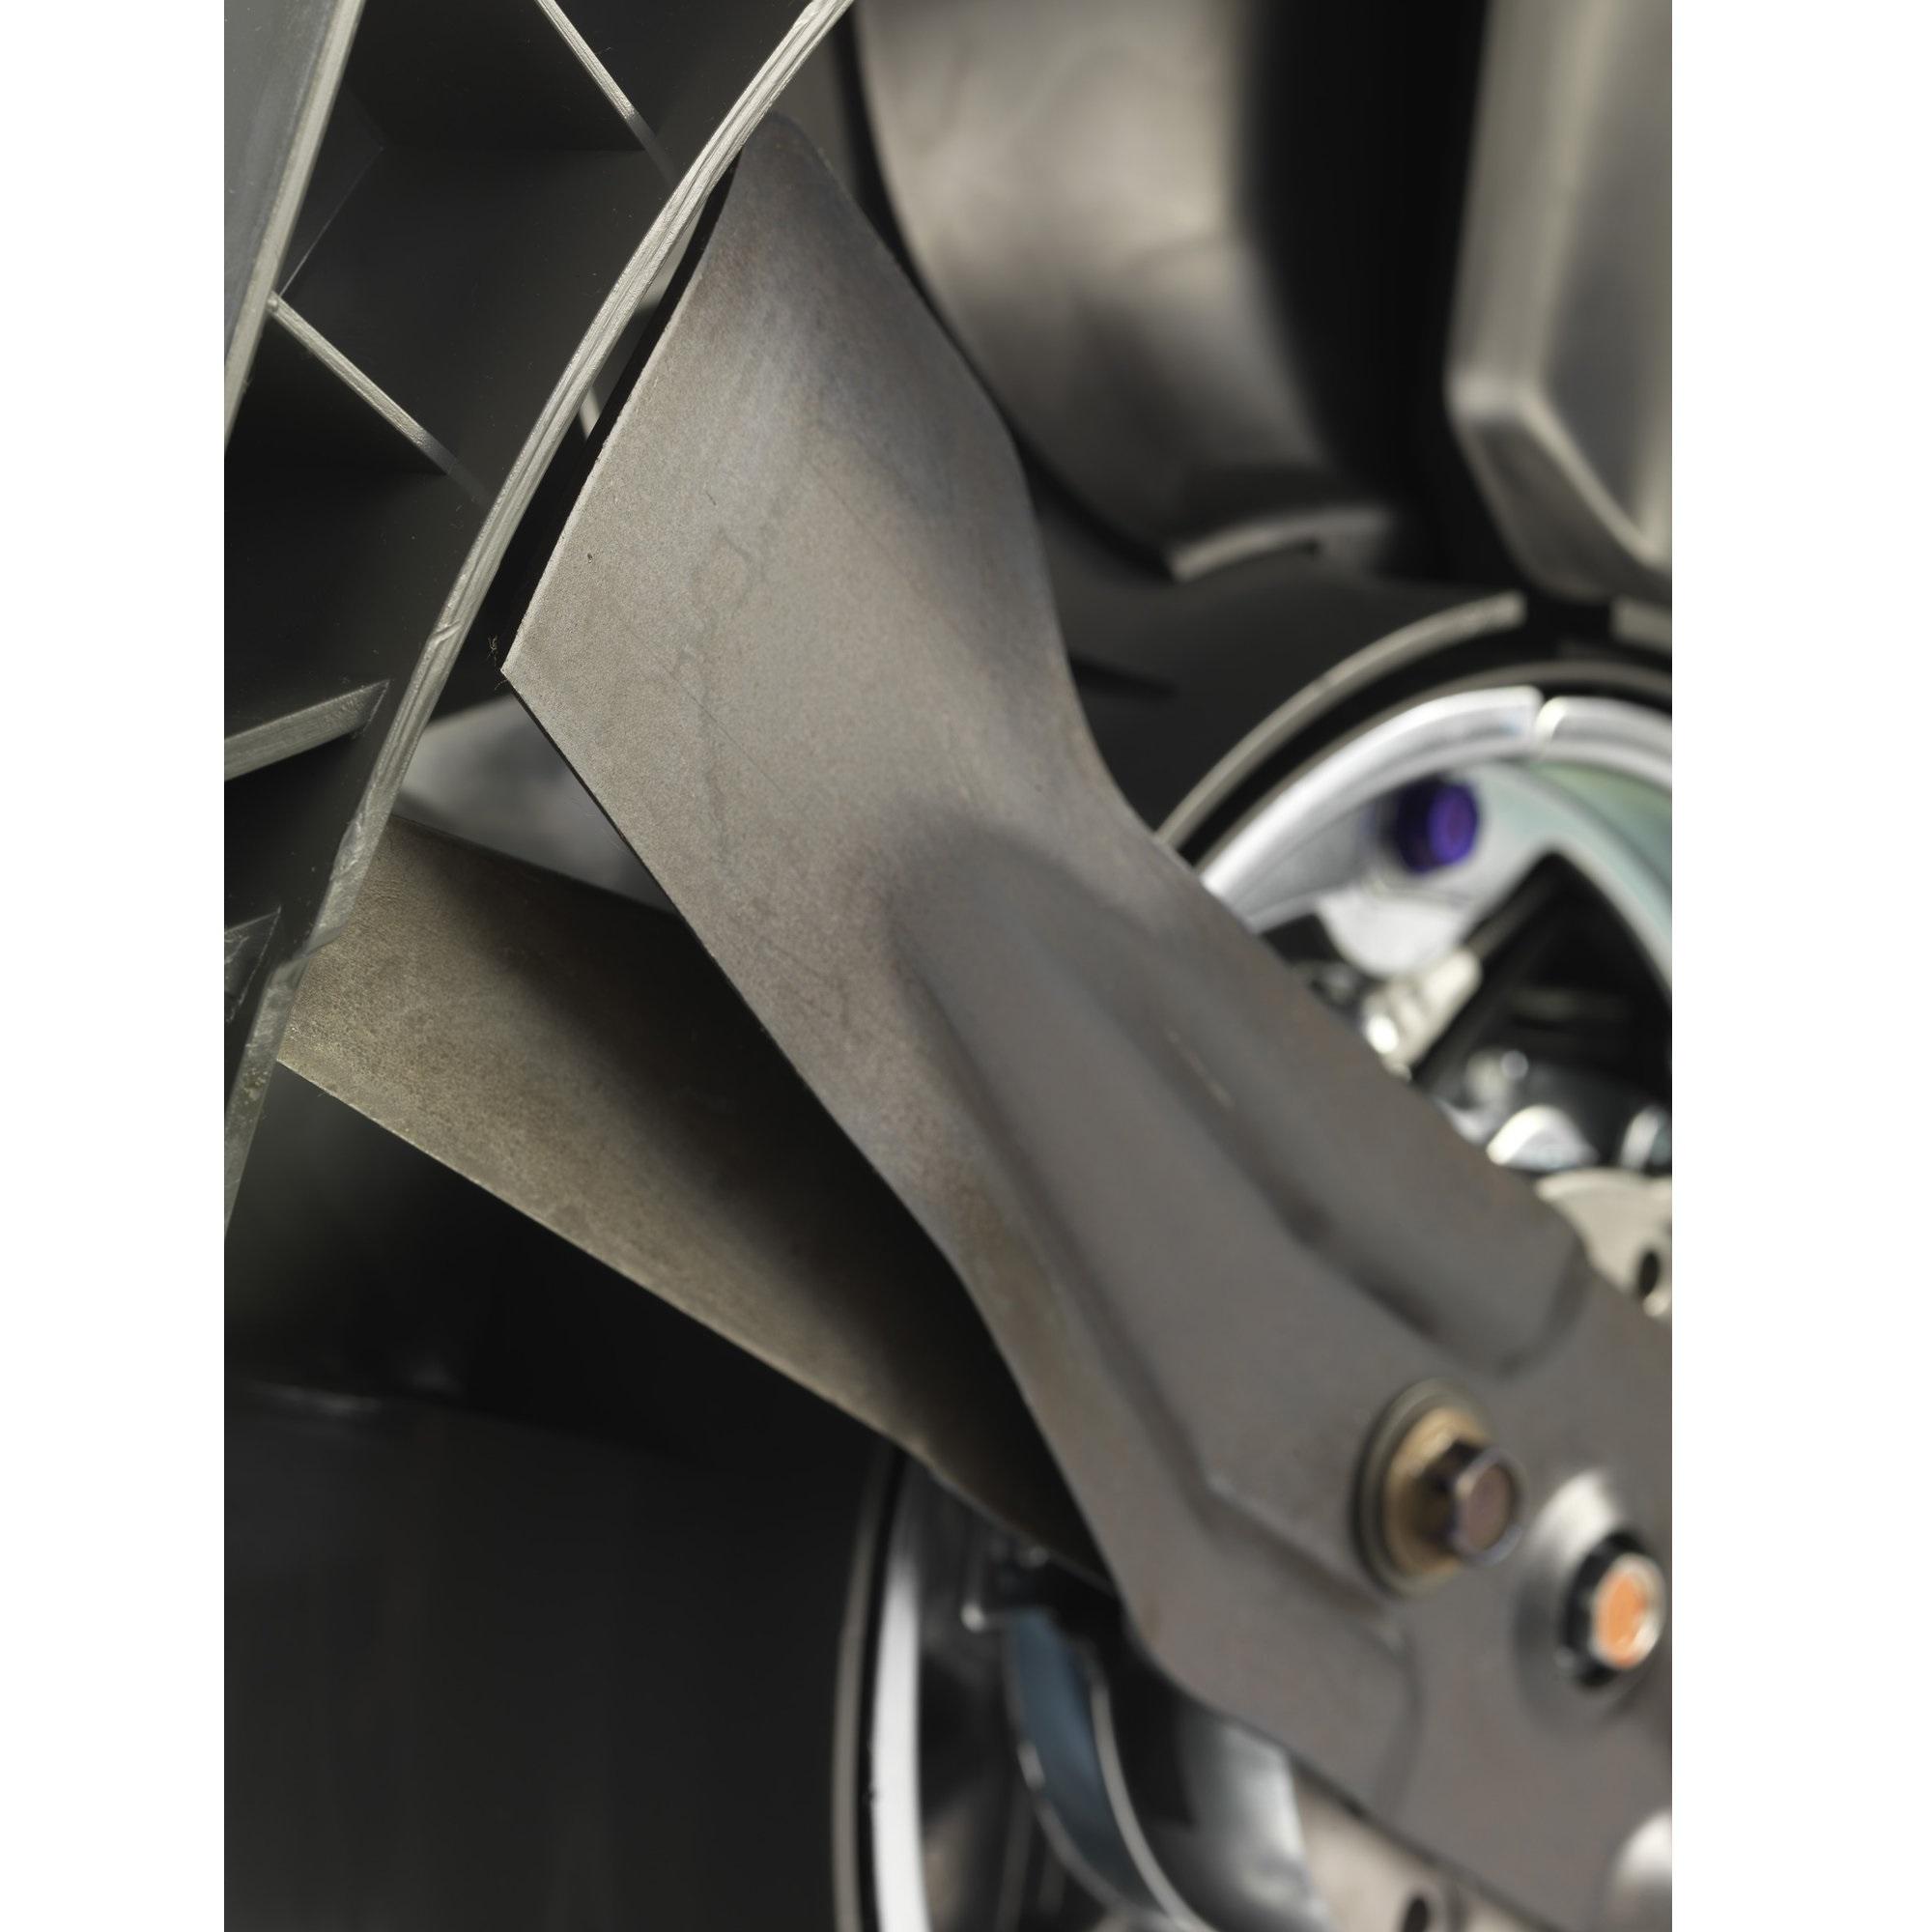 Honda HRG 466 C1 SKEP motorová sekačka s pojezdem, dva sekací nože Honda H718775 L-11